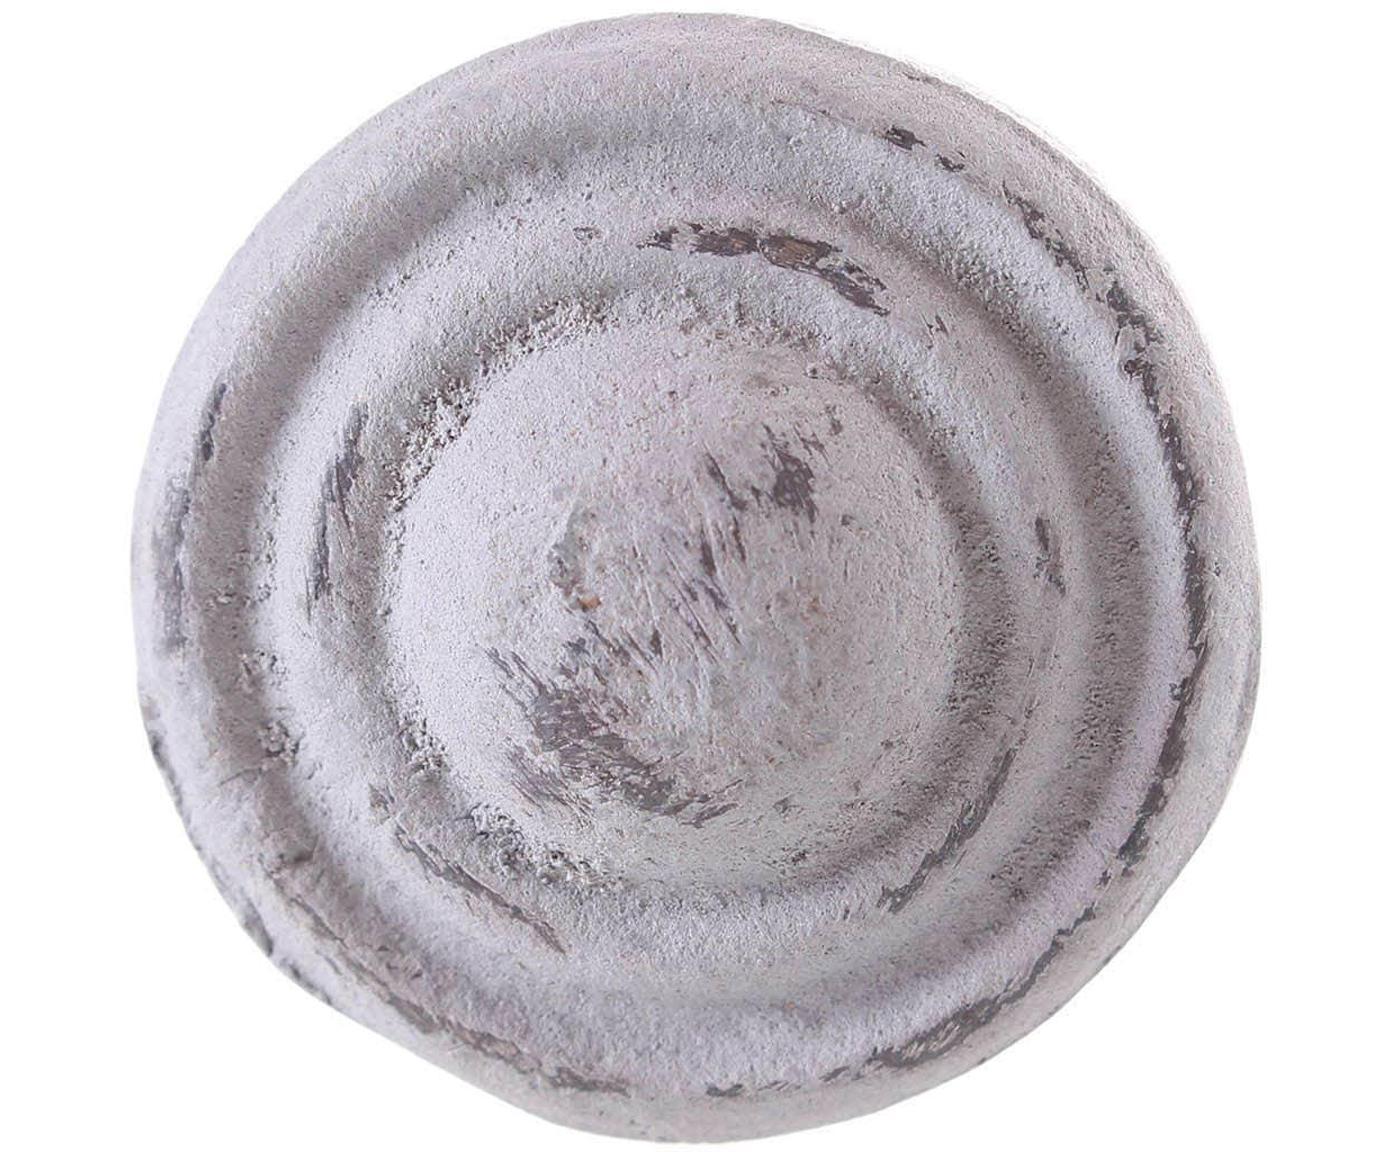 Tirador Antique, Cerámica, metal, Gris, Ø 3 cm